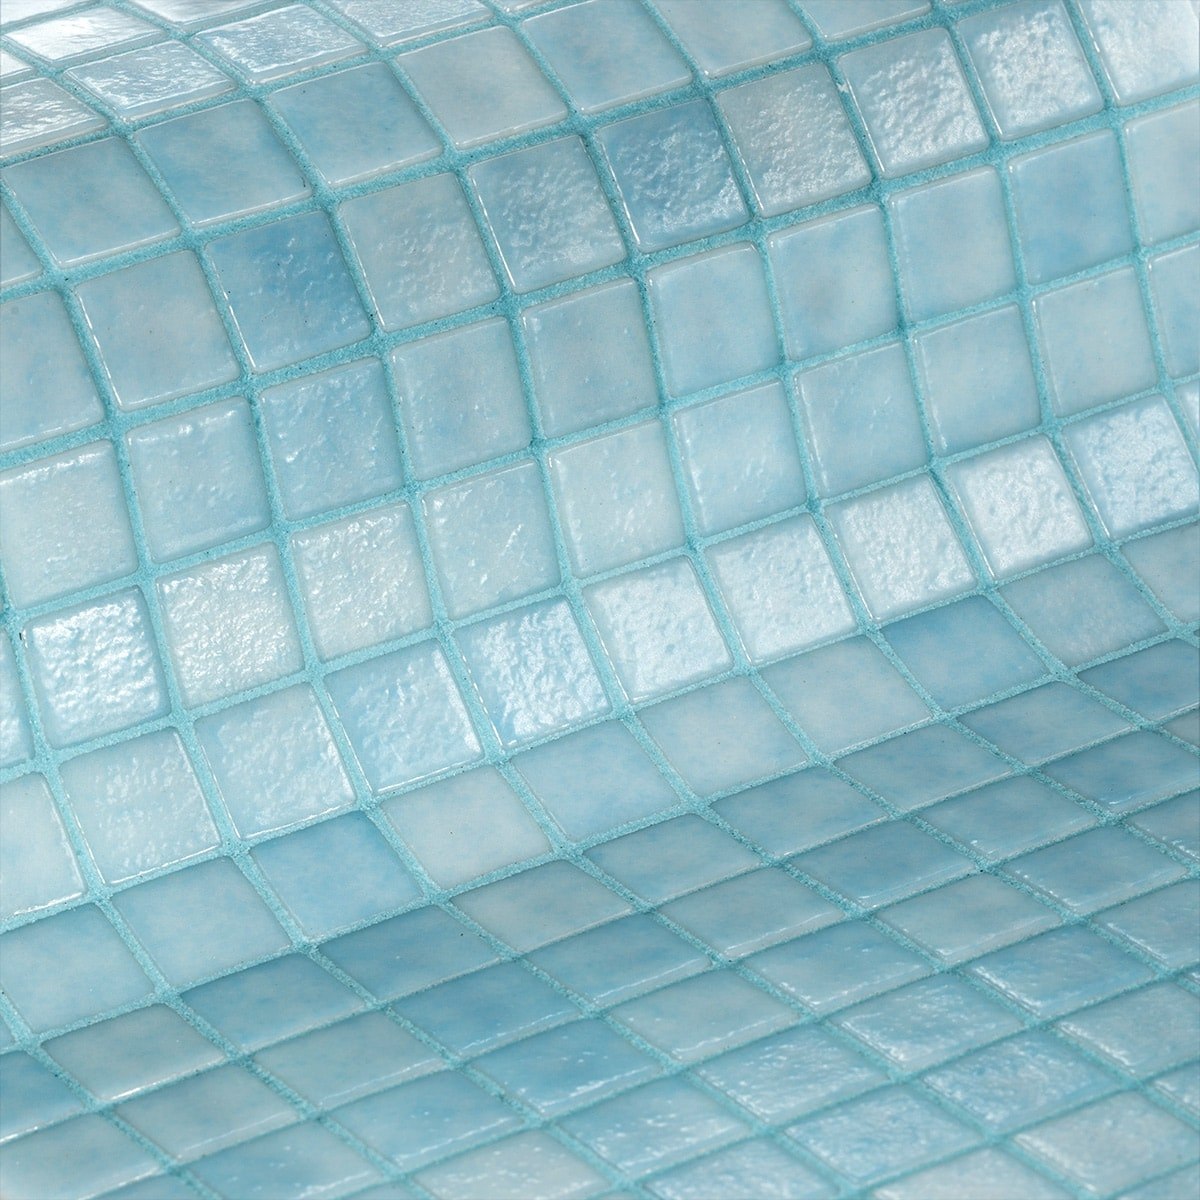 2521-B-Safe-Safe-steps-Mosaic-Ezarri.jpg